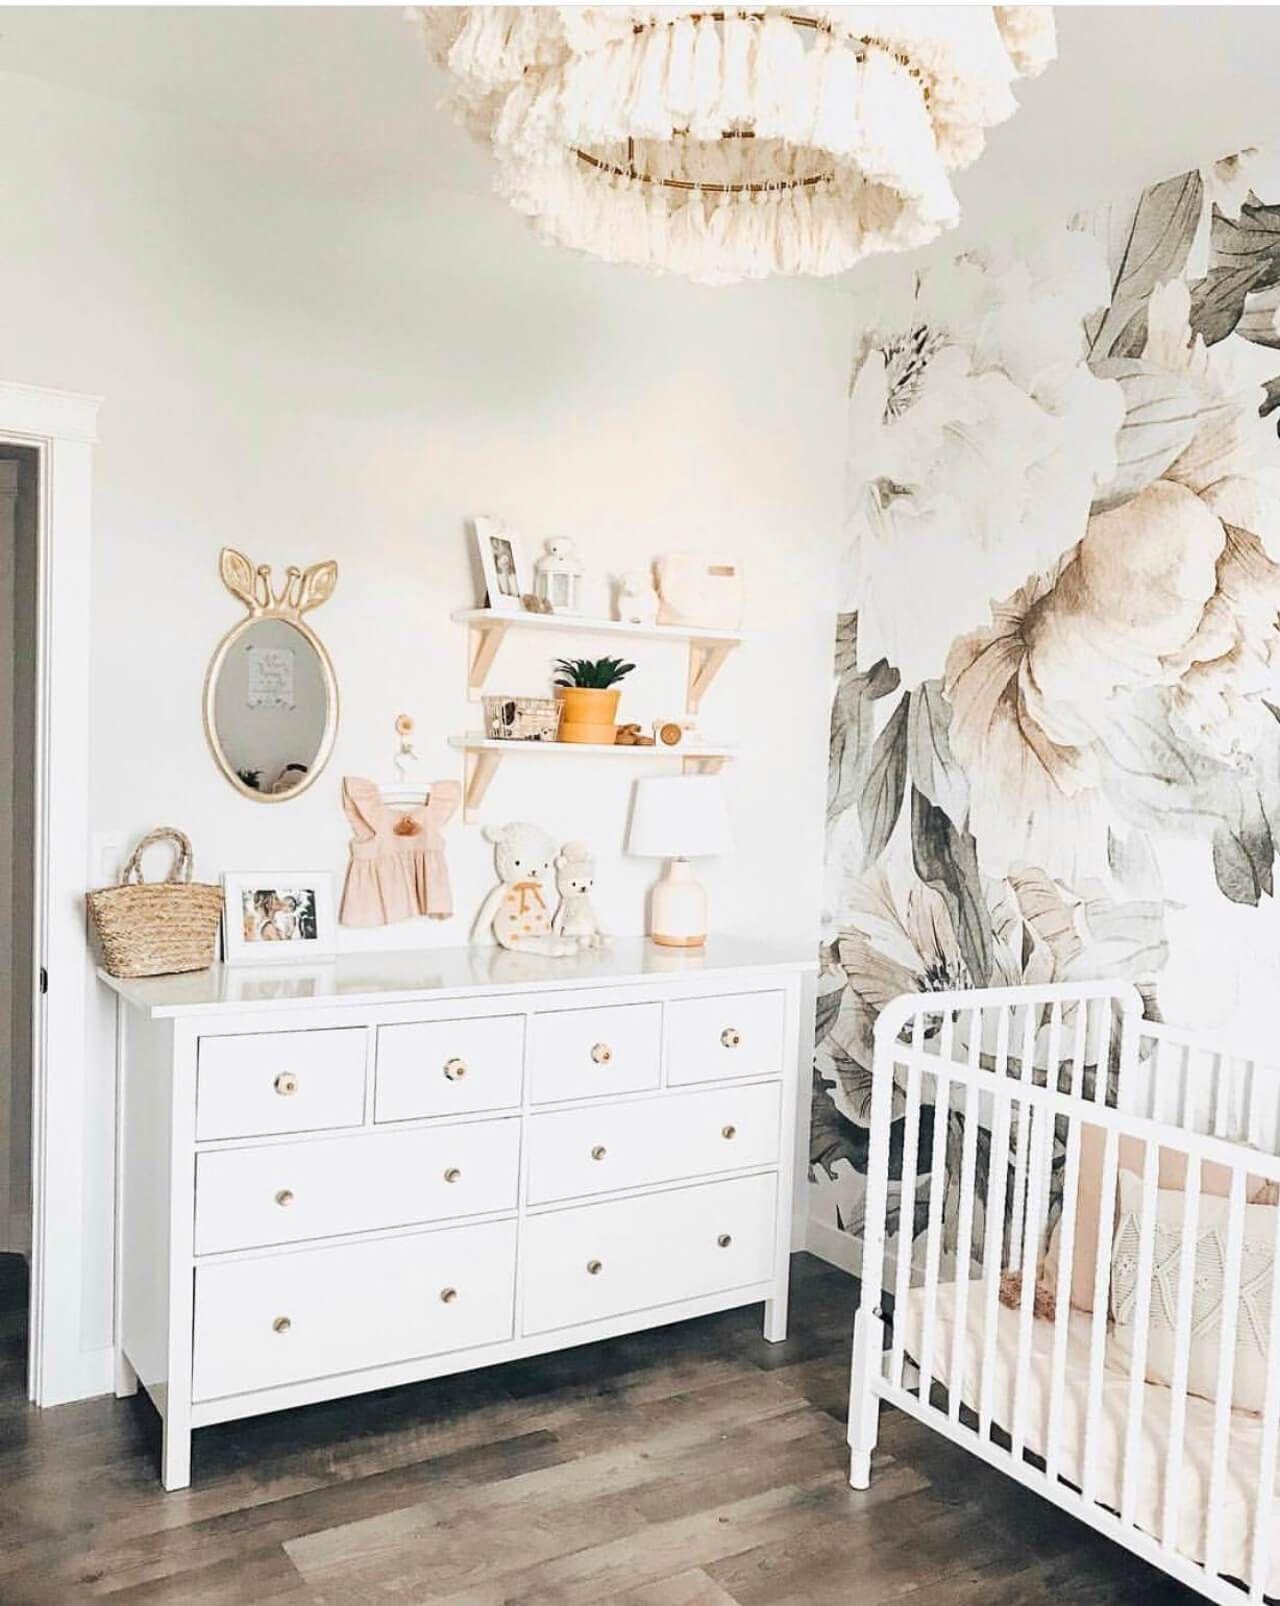 Unsere Baby Girl Nursery Decor Inspiration